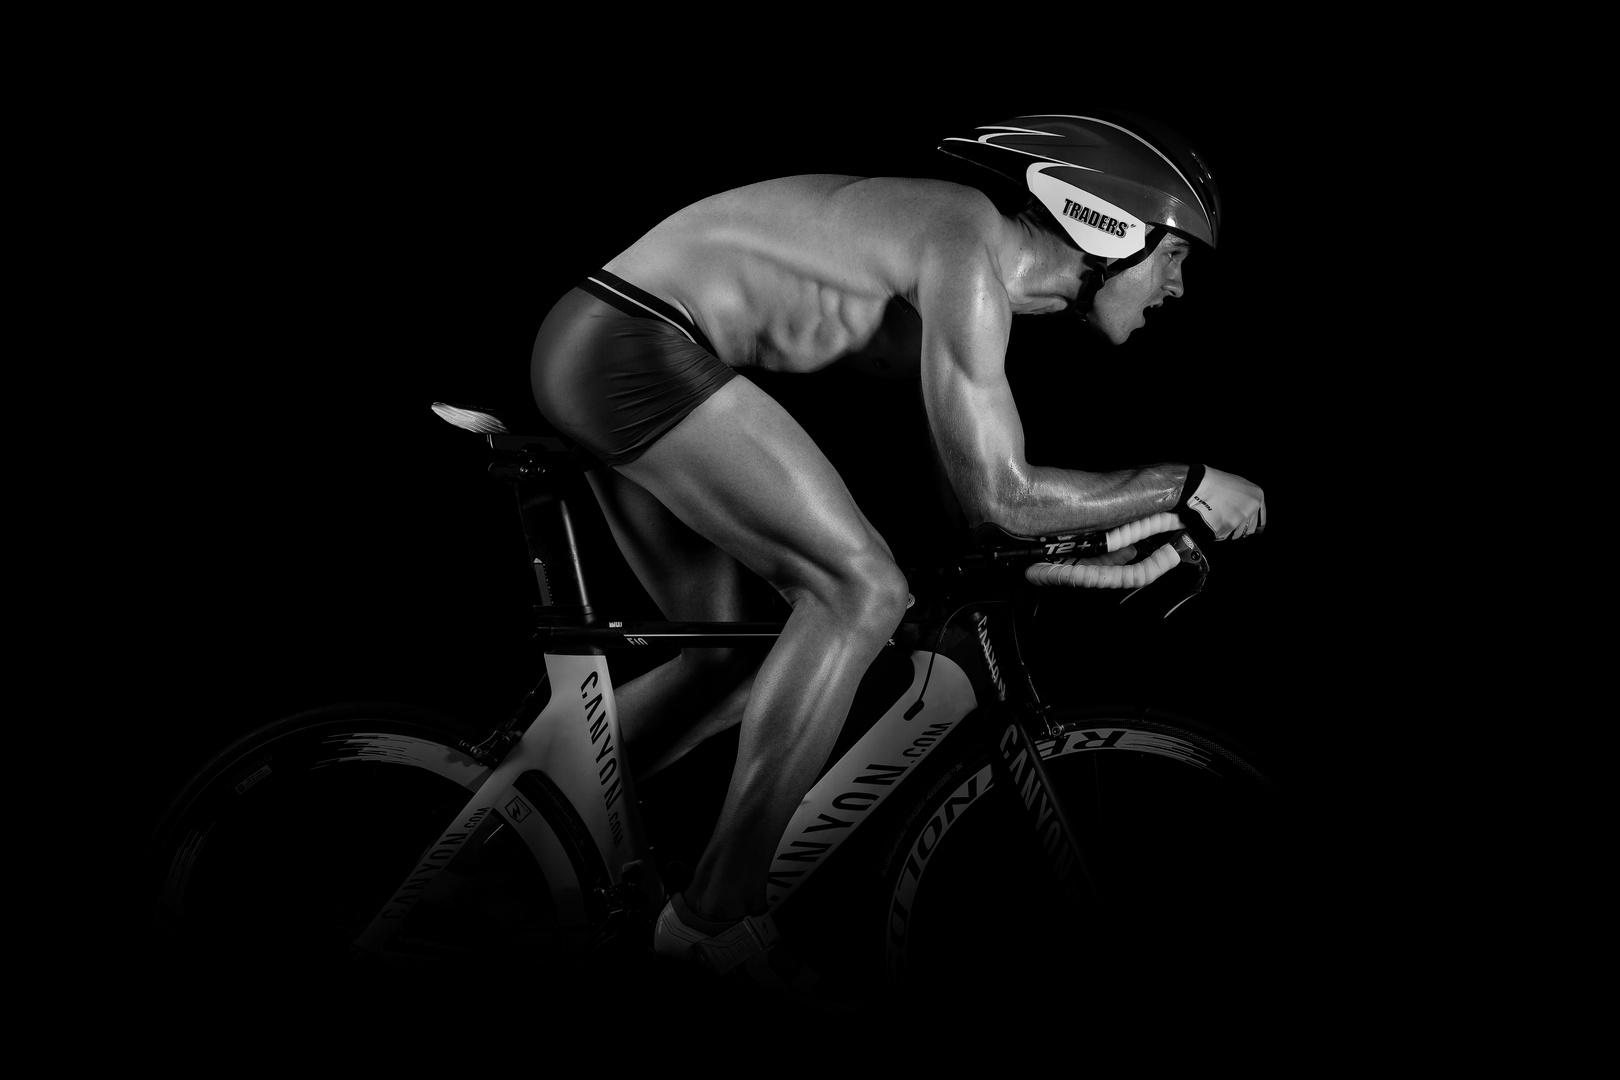 Triathlonrad: Aero-Position